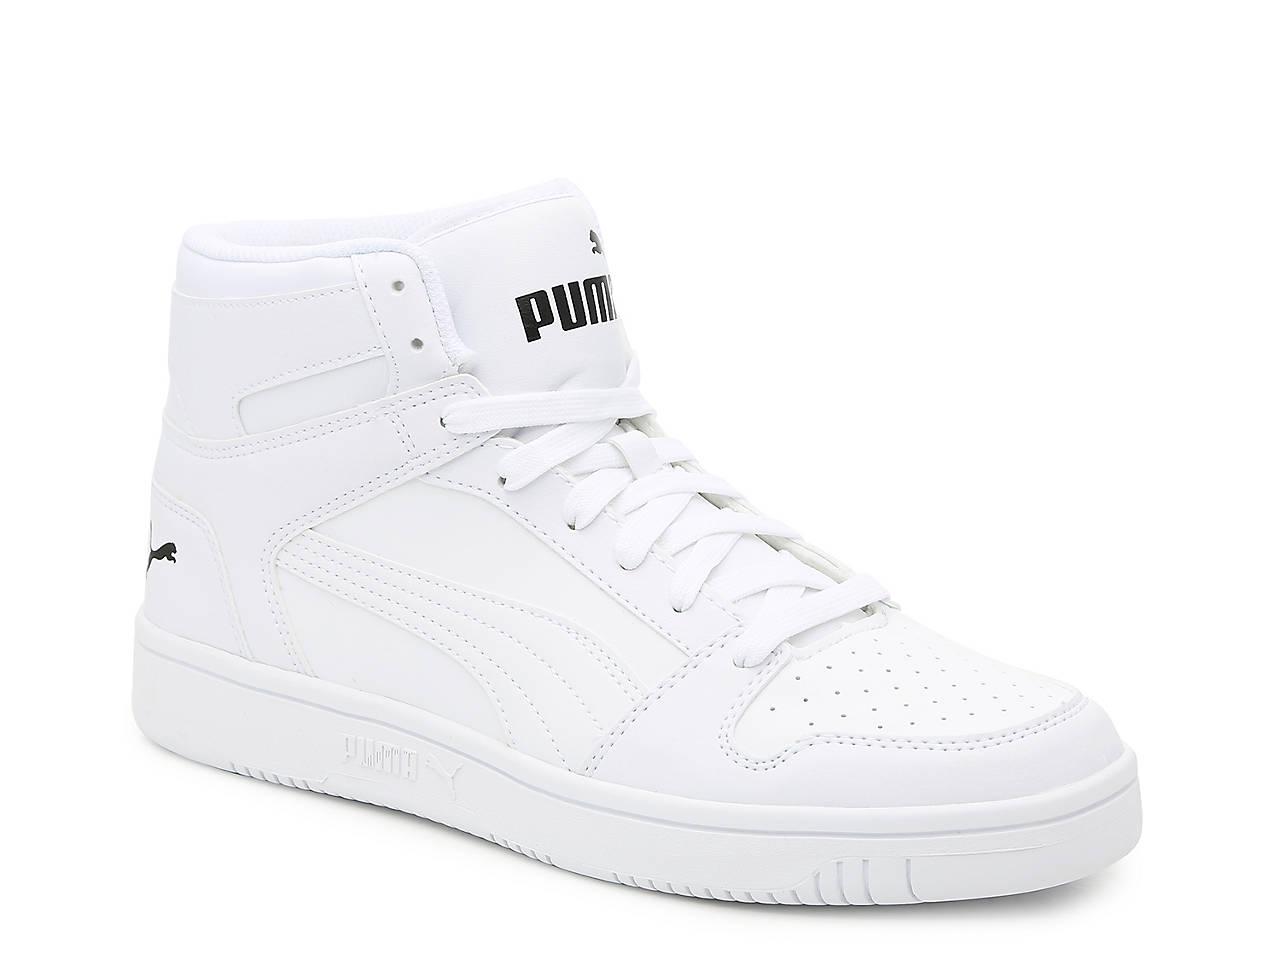 Rebound LayUp SL High Top Sneaker Men's